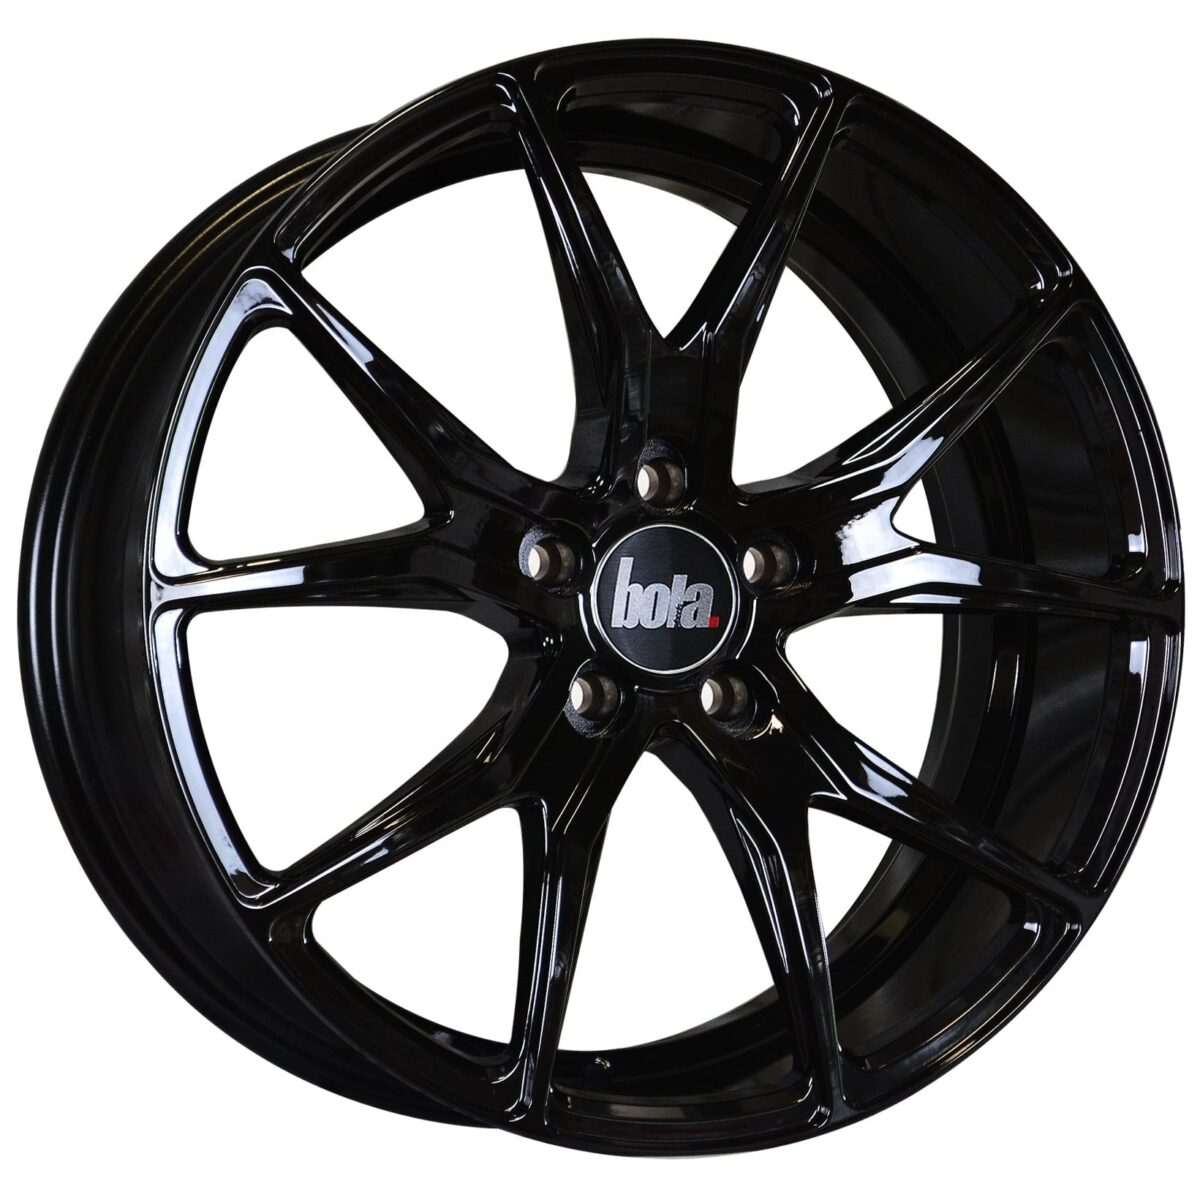 "18"" BOLA B6 Wheels - Gloss Black - VW / Audi / Mercedes - 5x112"